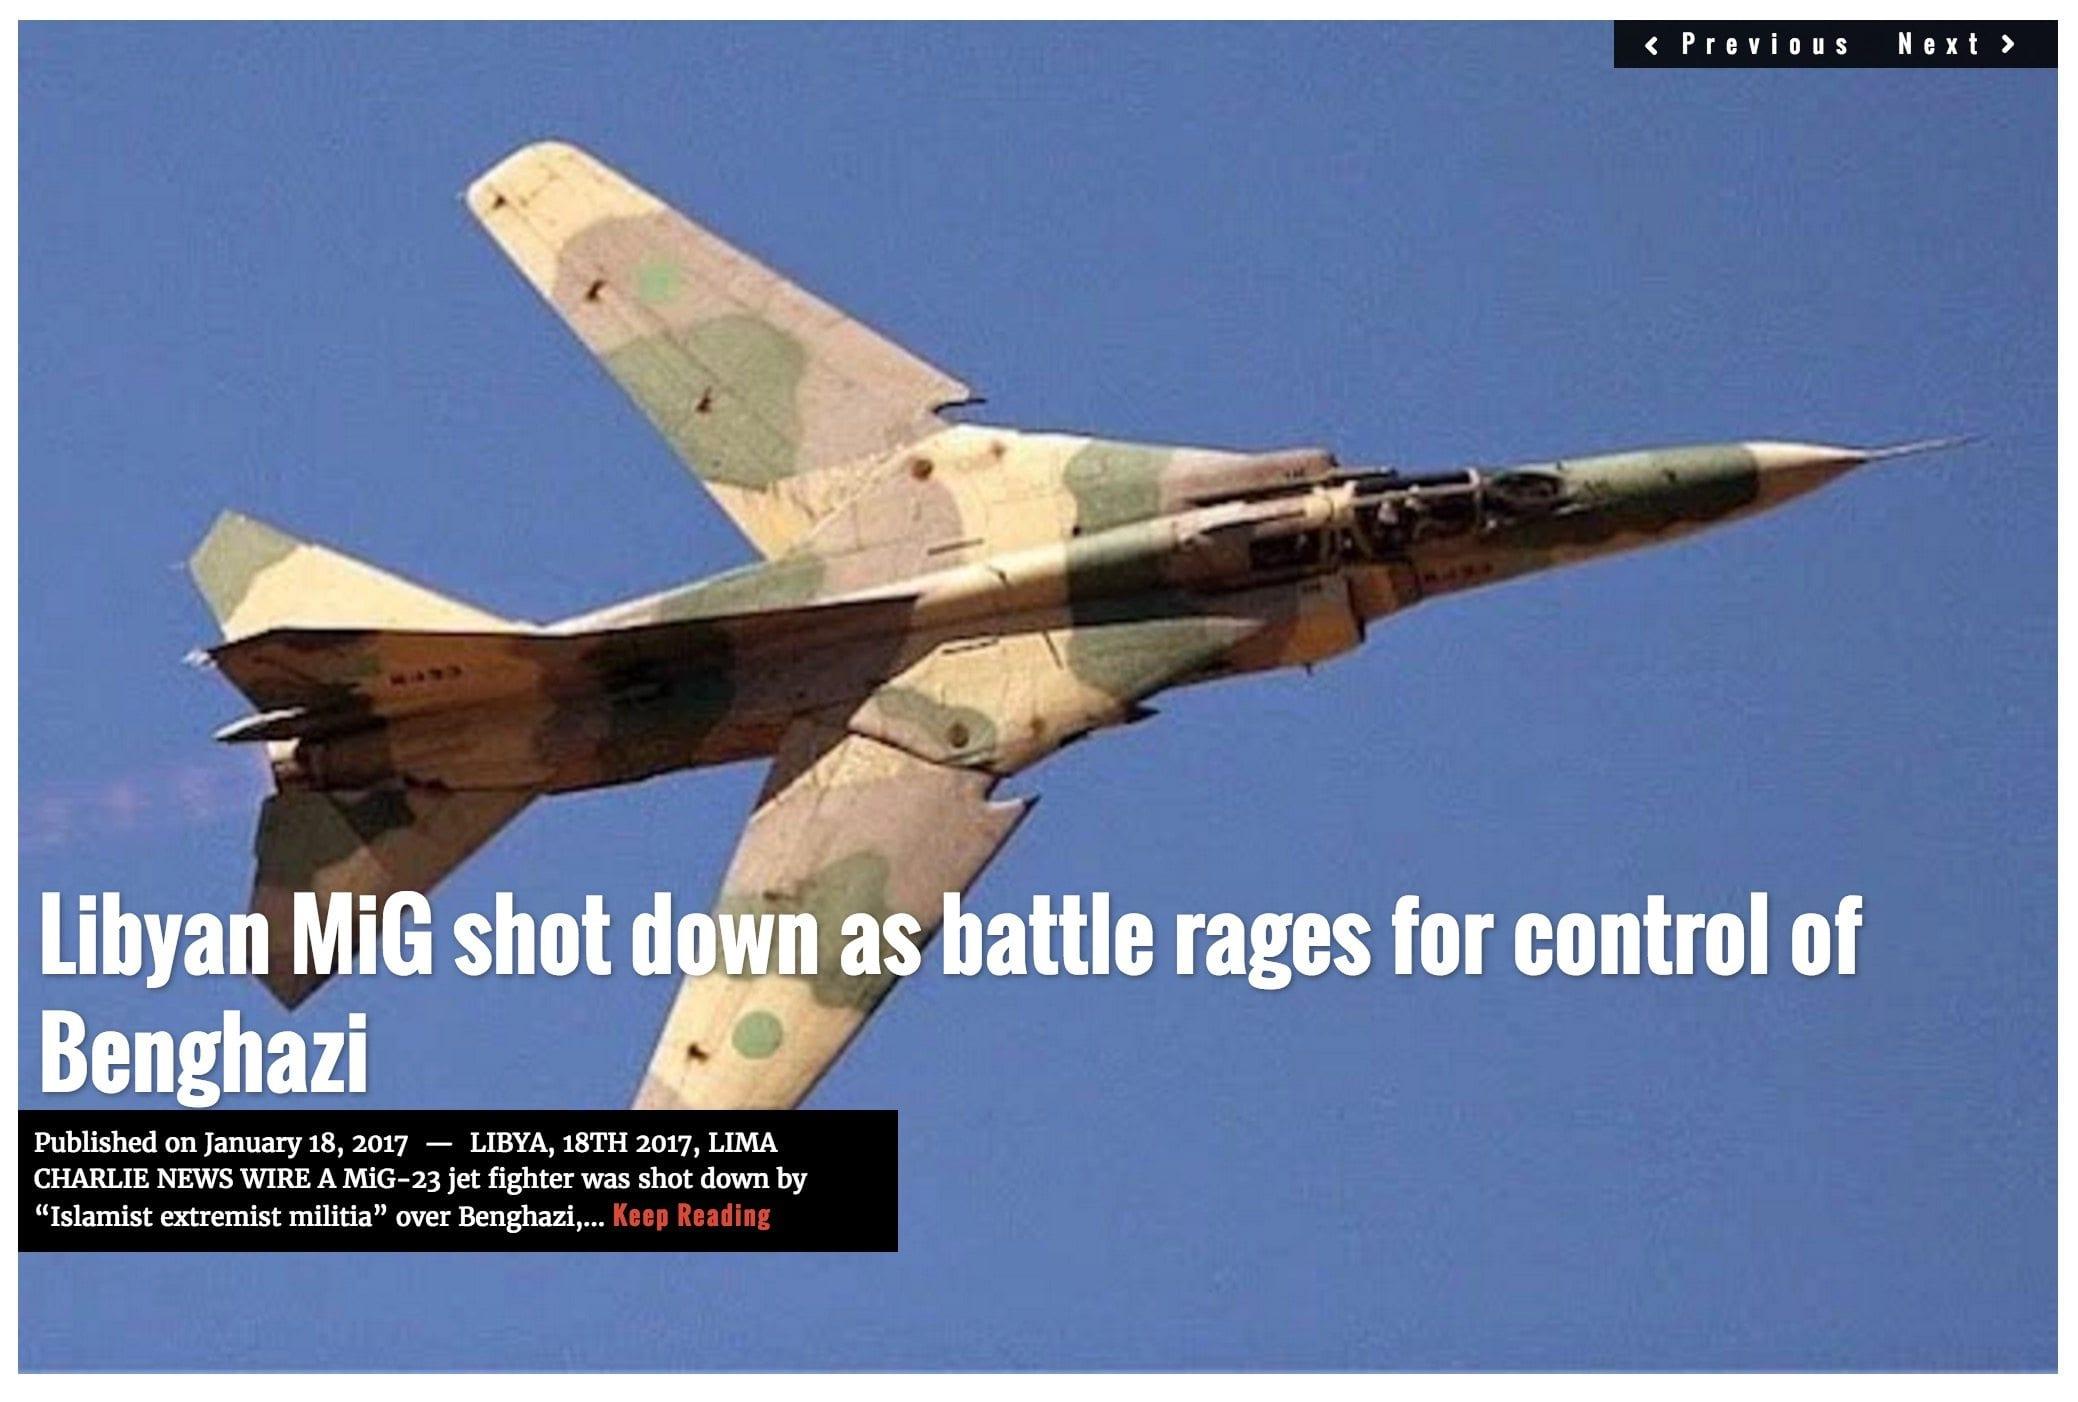 Lima Charlie News headline Benghazi